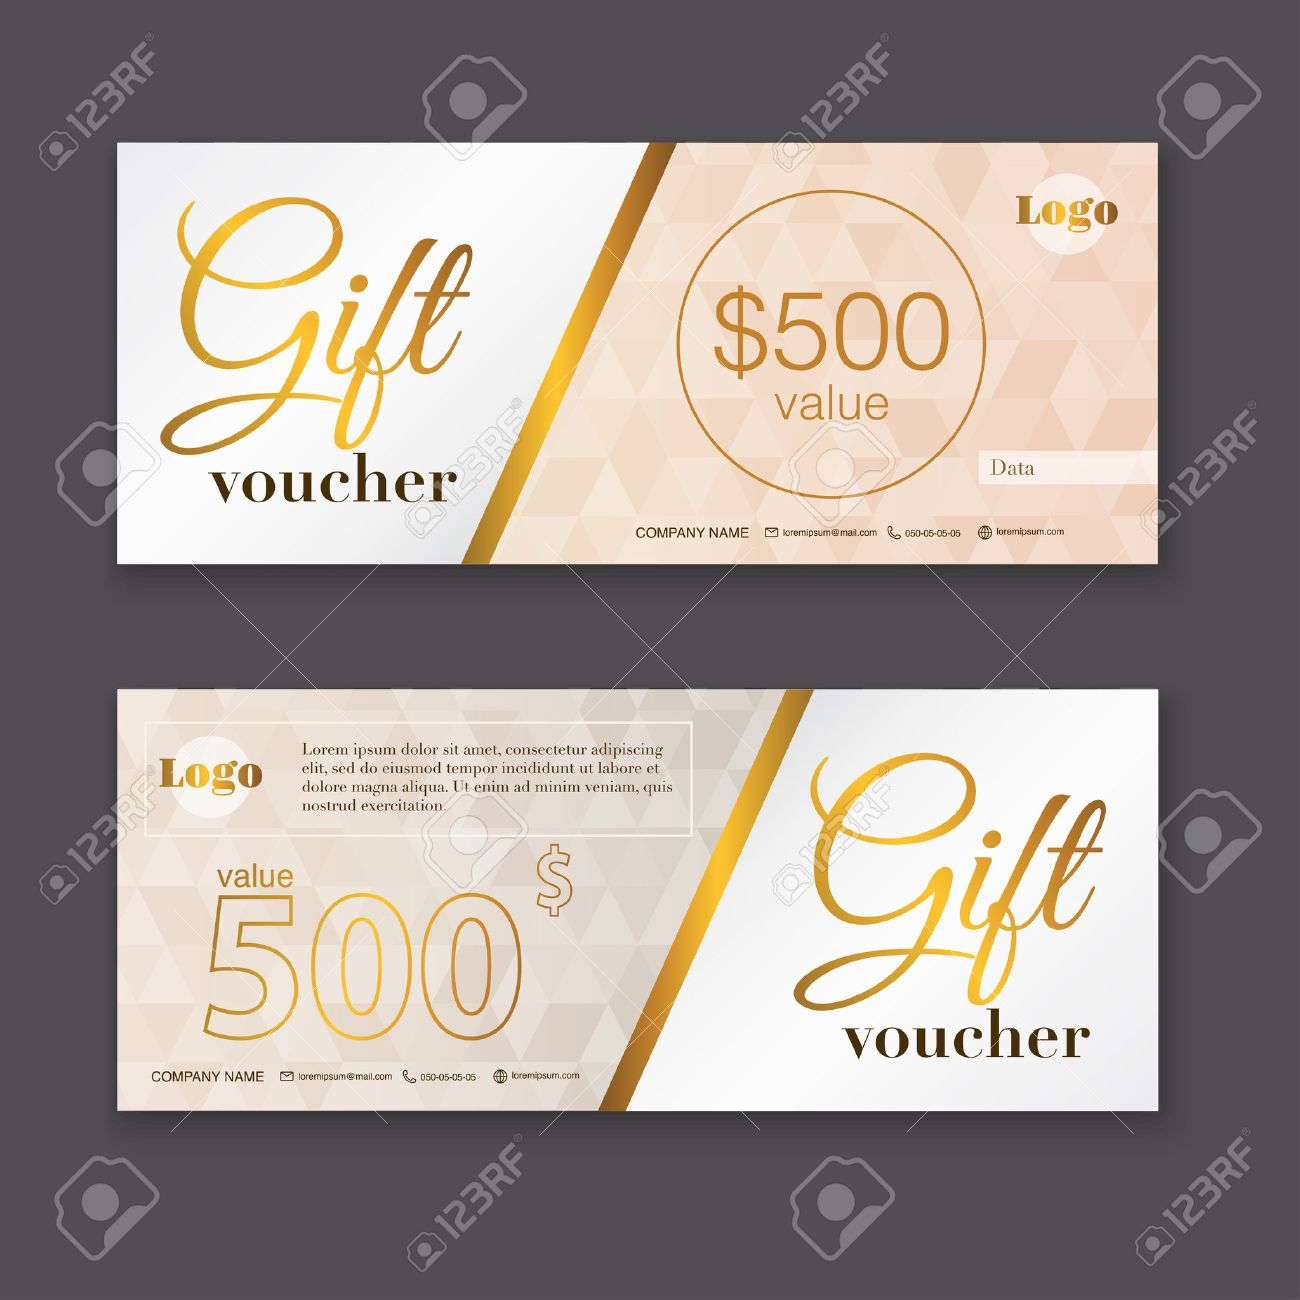 voucher template free – Design Gift Vouchers Free